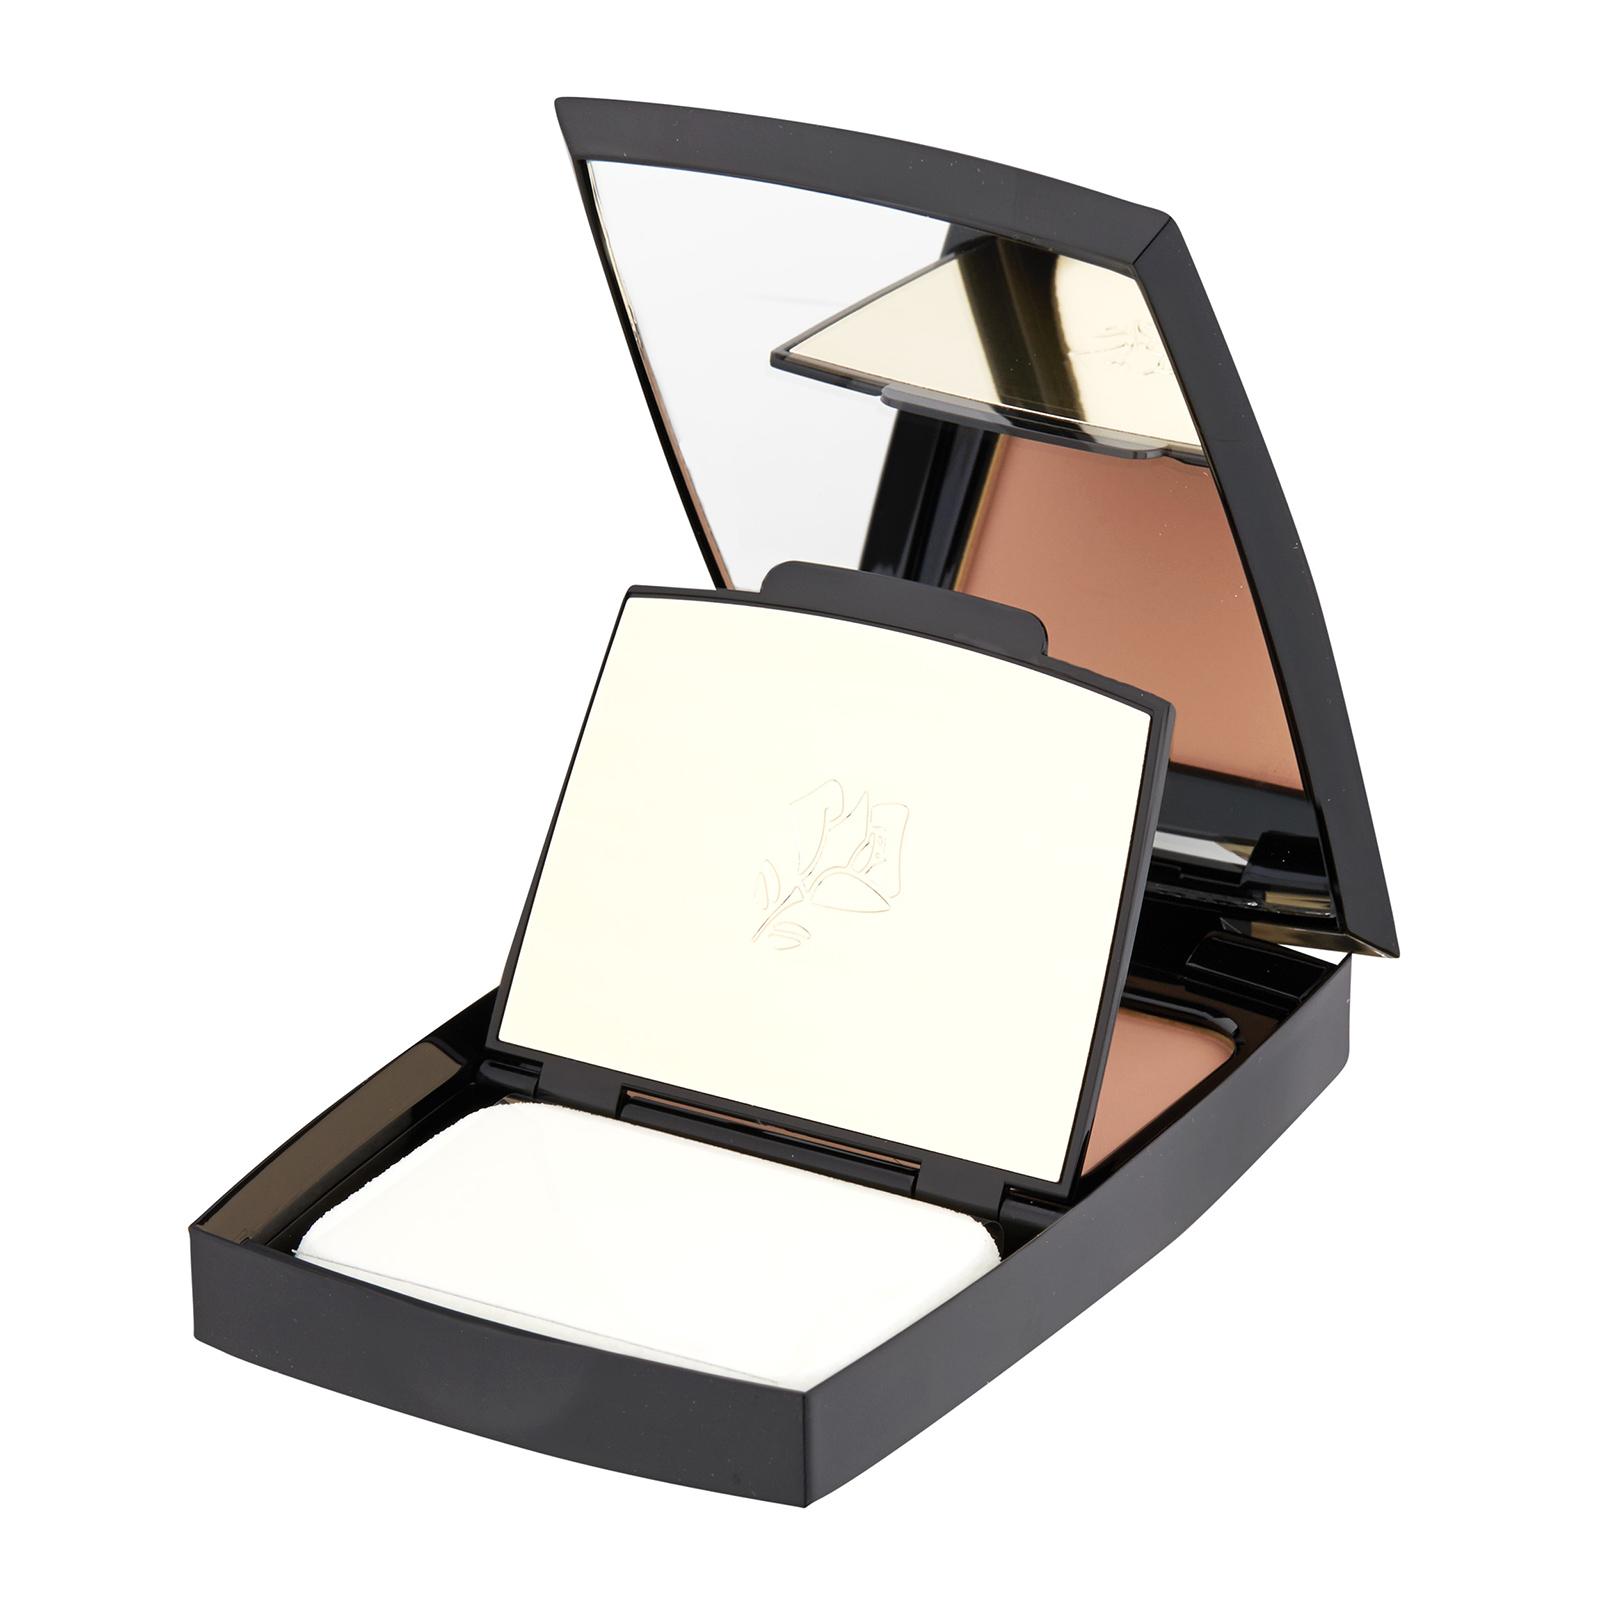 LANCÔME Teint Idole Ultra  Compact Powder Foundation Long-Wear Matte Finish Retouch-Free Shine Control 02 LYS Rose, 0.38oz, 11g